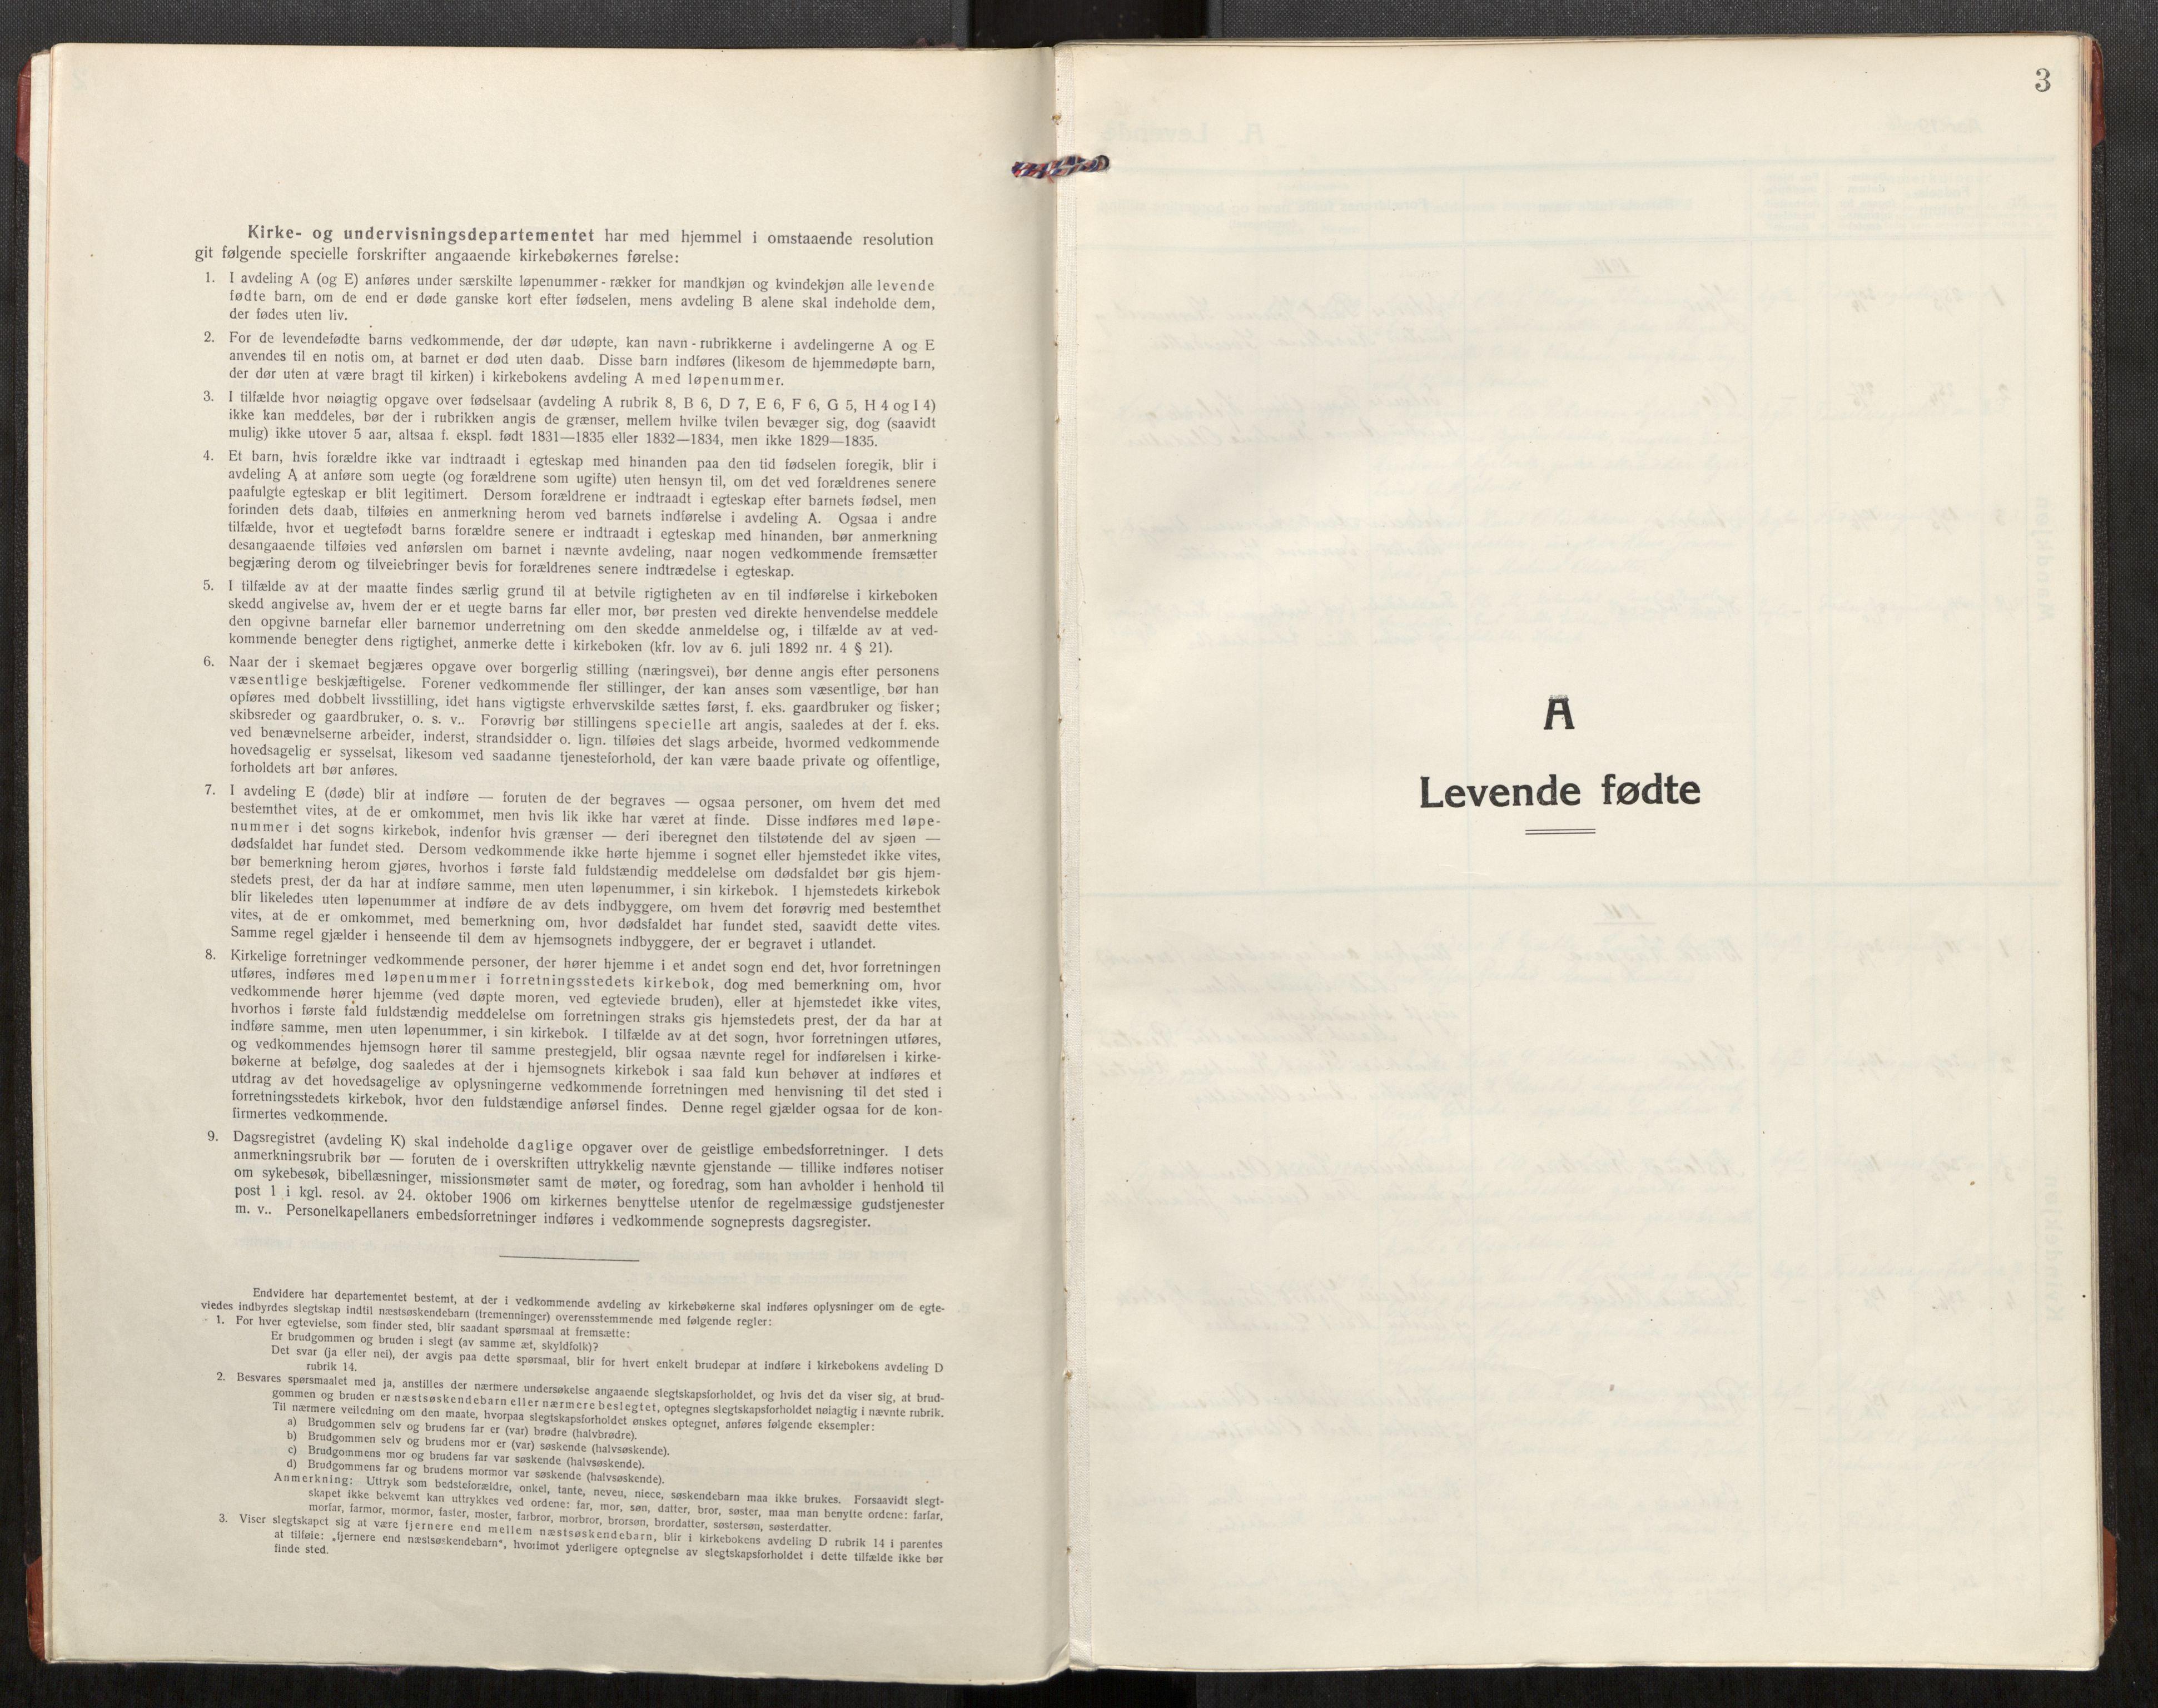 SAT, Grytten sokneprestkontor, Ministerialbok nr. 550A02, 1916-1931, s. 3